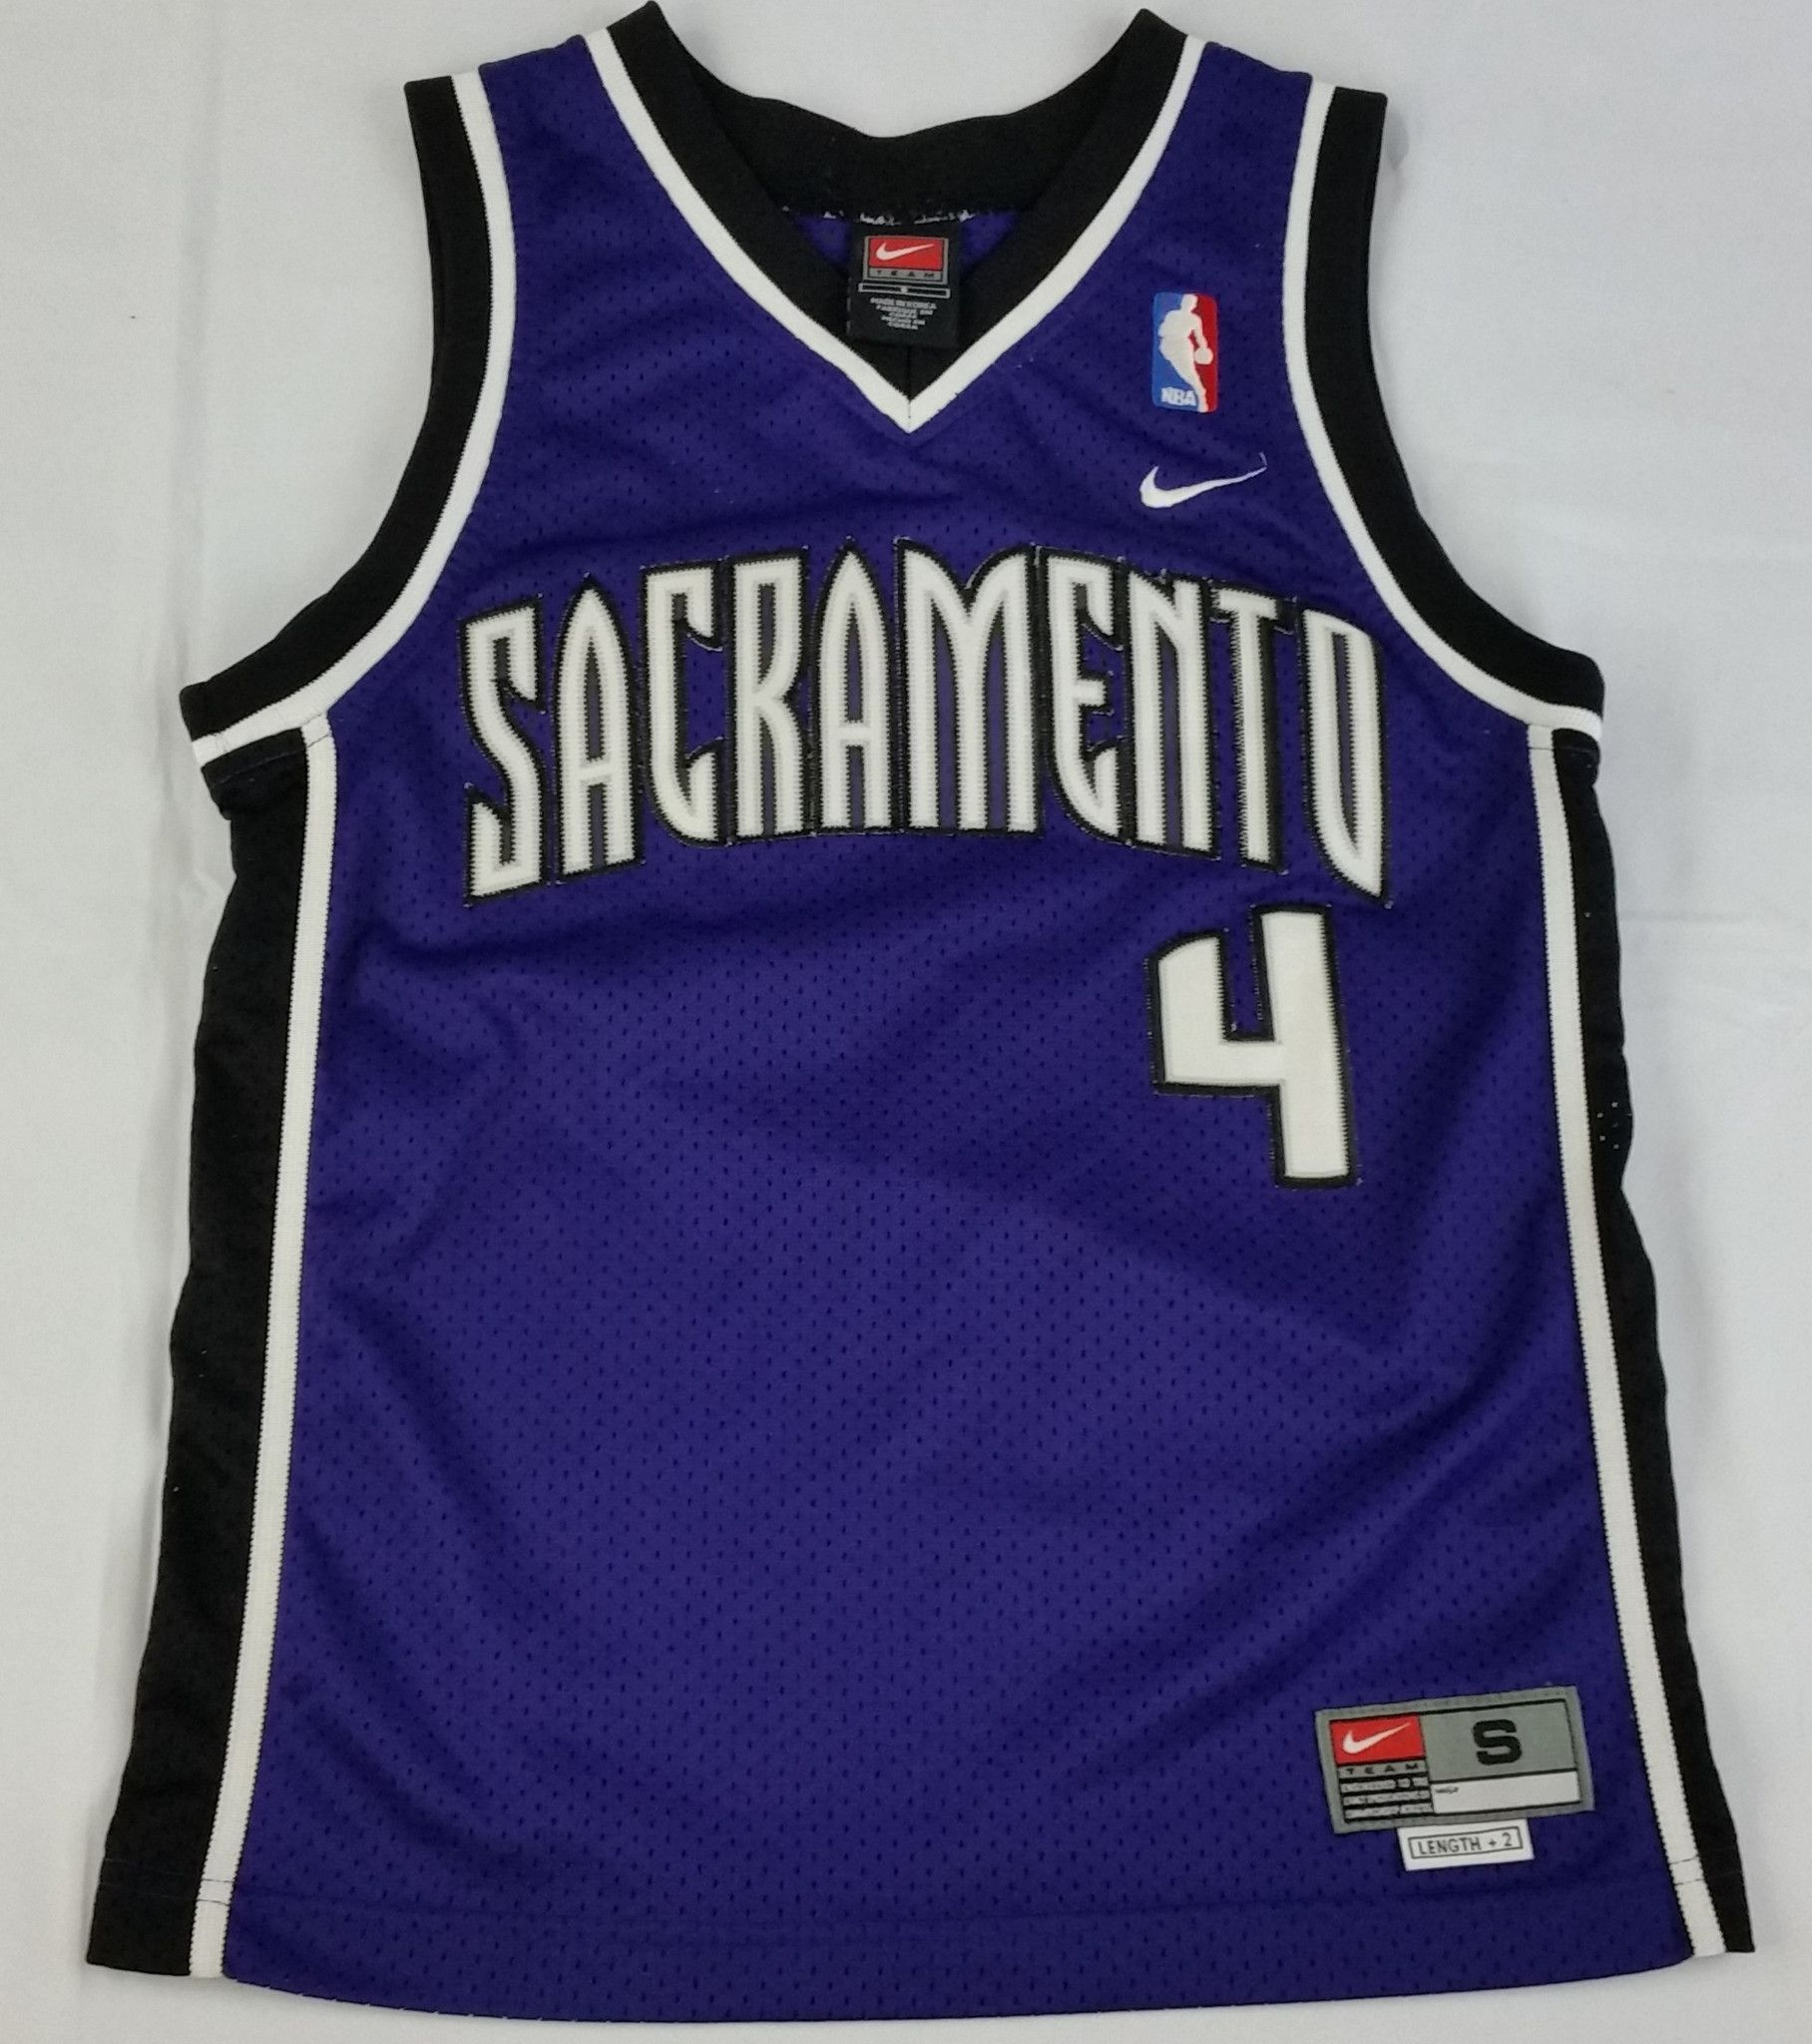 chris webber 4 sacramento kings jersey nike nba swingman purple youth boys s